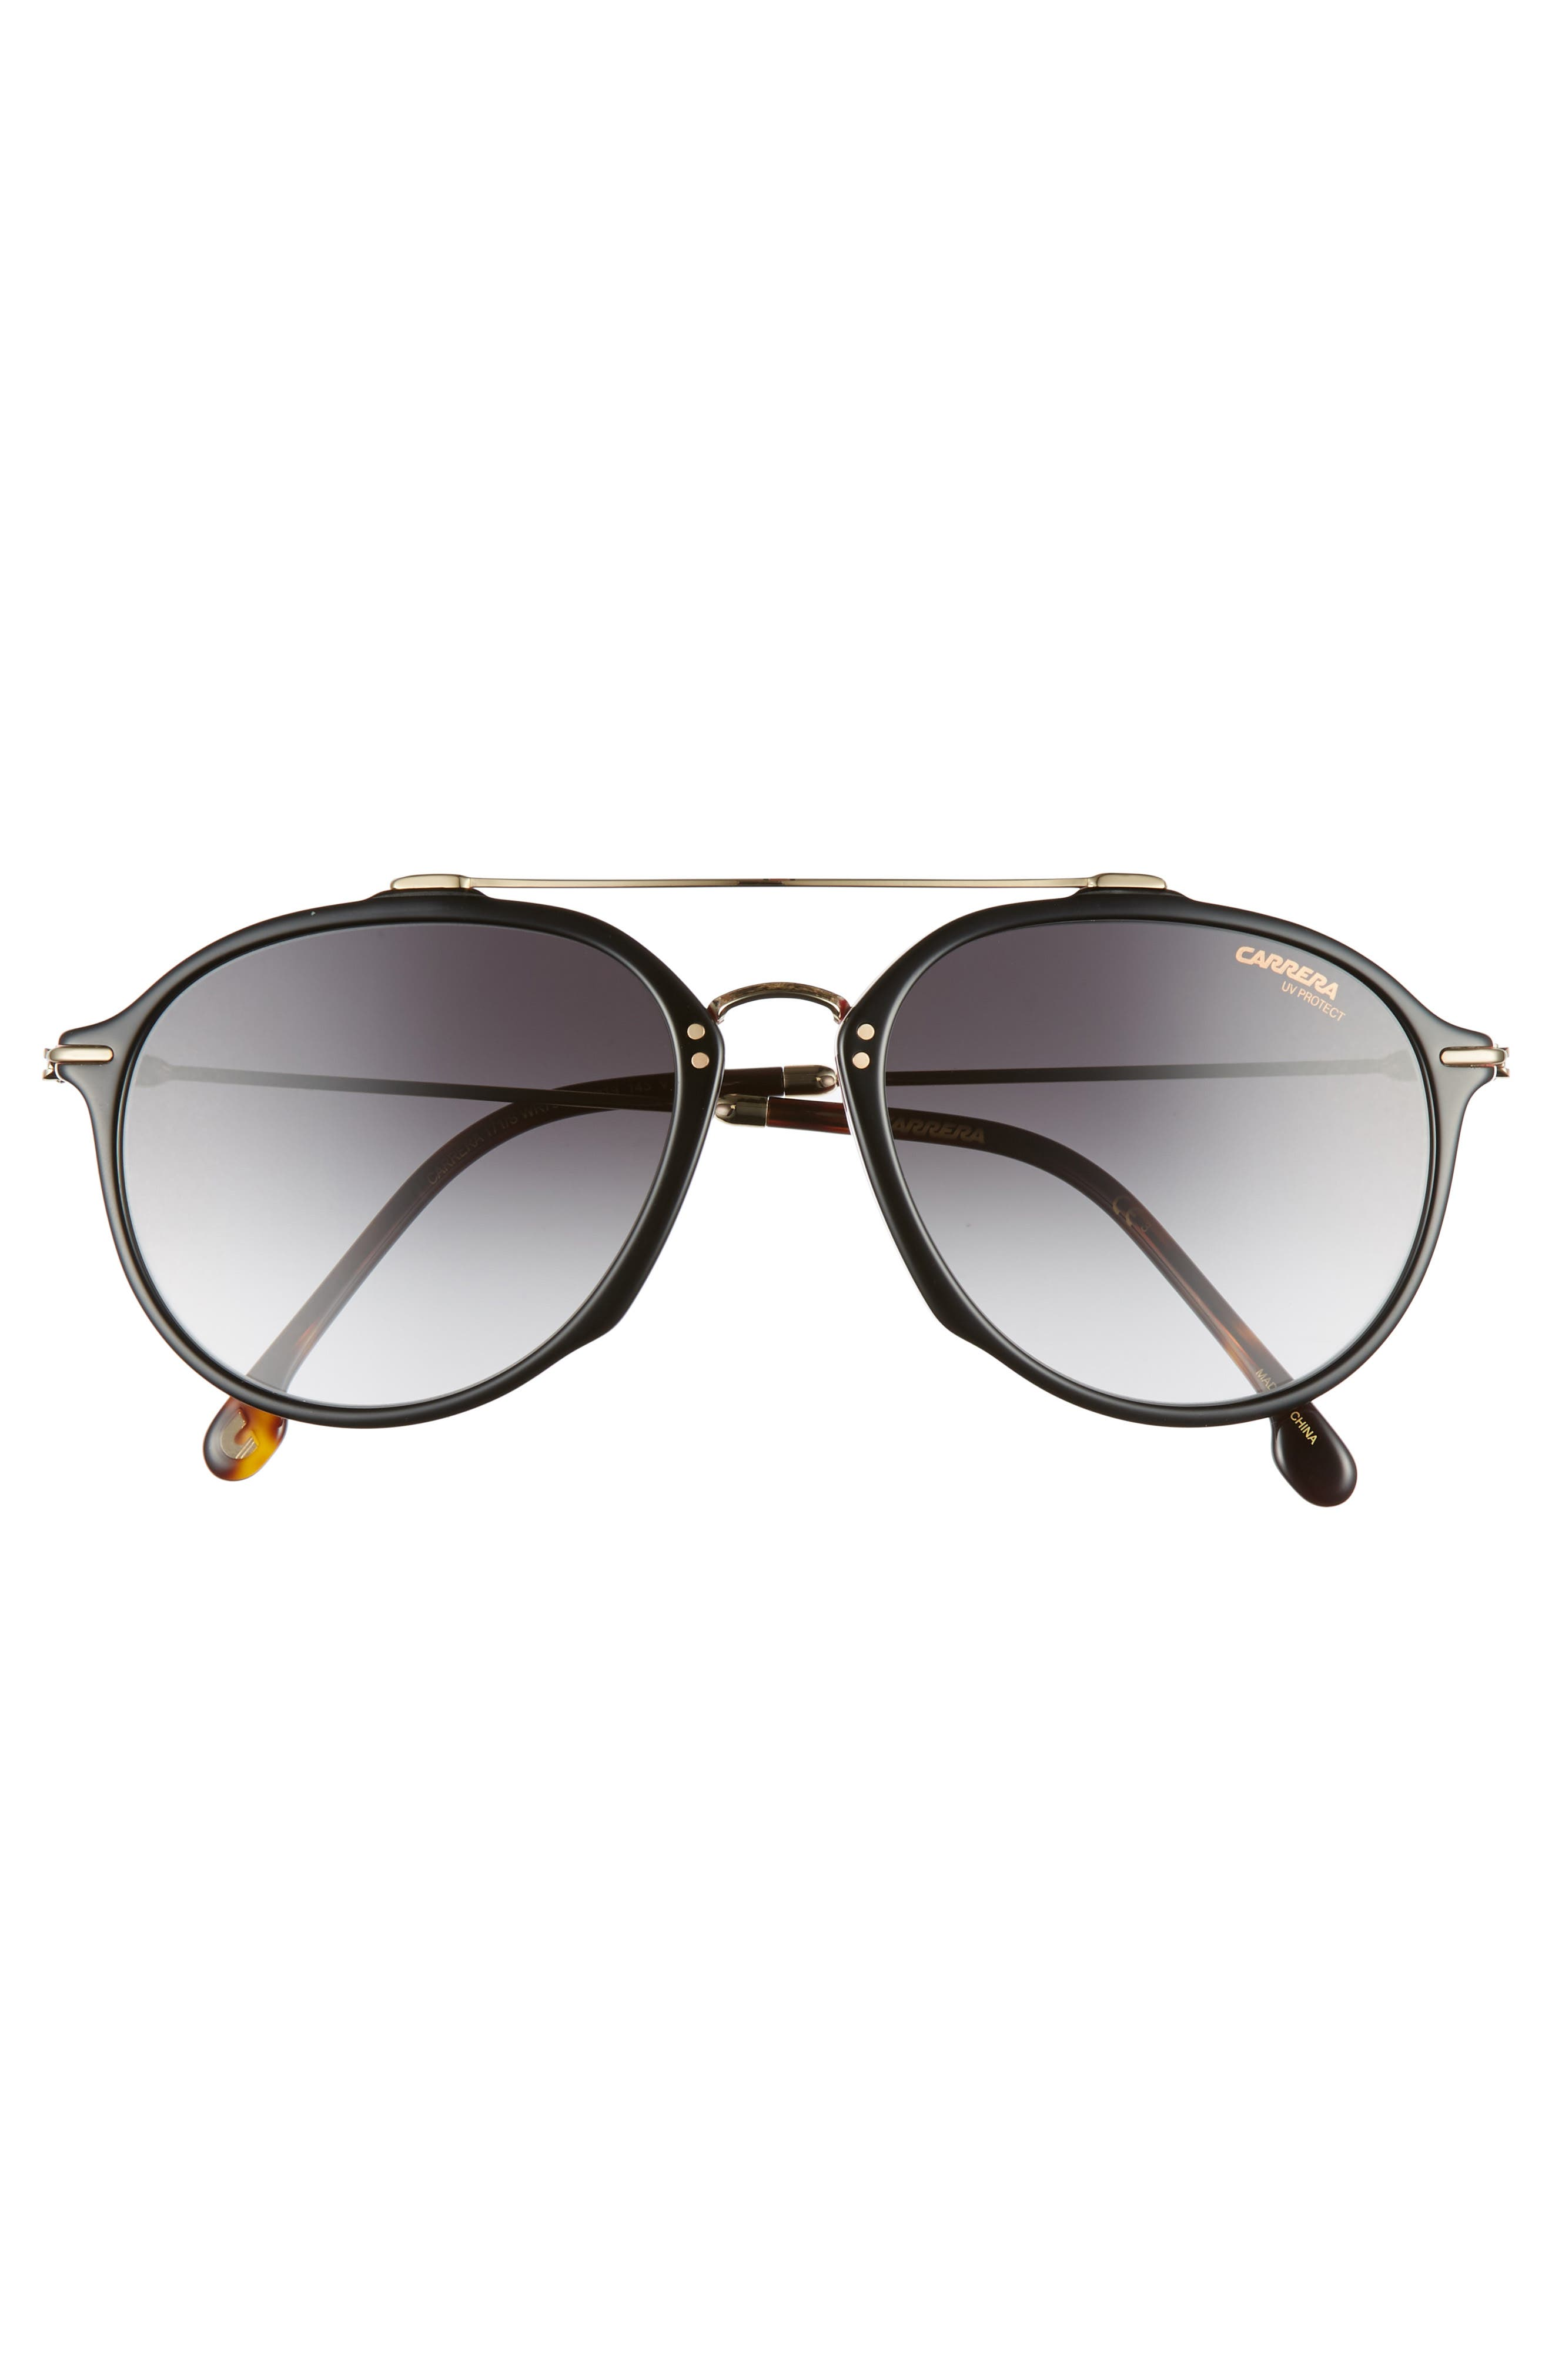 55mm Round Sunglasses,                             Alternate thumbnail 2, color,                             BLACK HAVANA